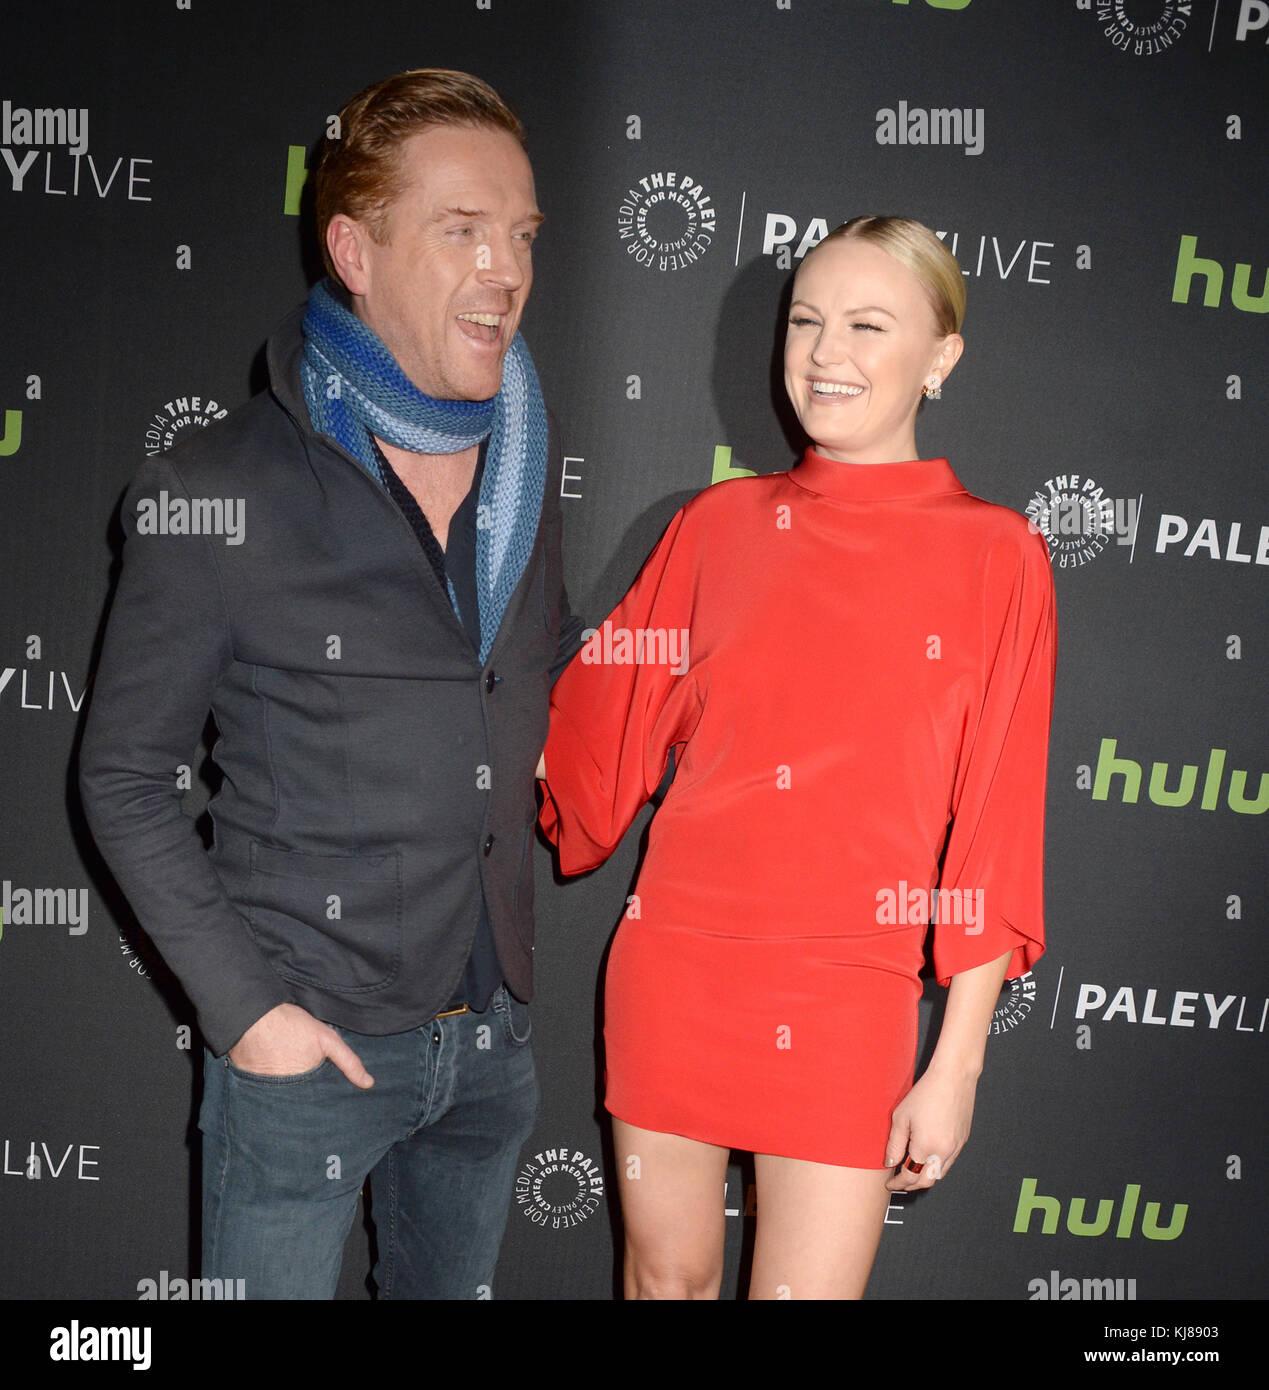 NEW YORK, NY - DECEMBER 05: Damian Lewis, Malin Akerman  attends the Paley Live: Sneak Peek at Billions Season Two, - Stock Image